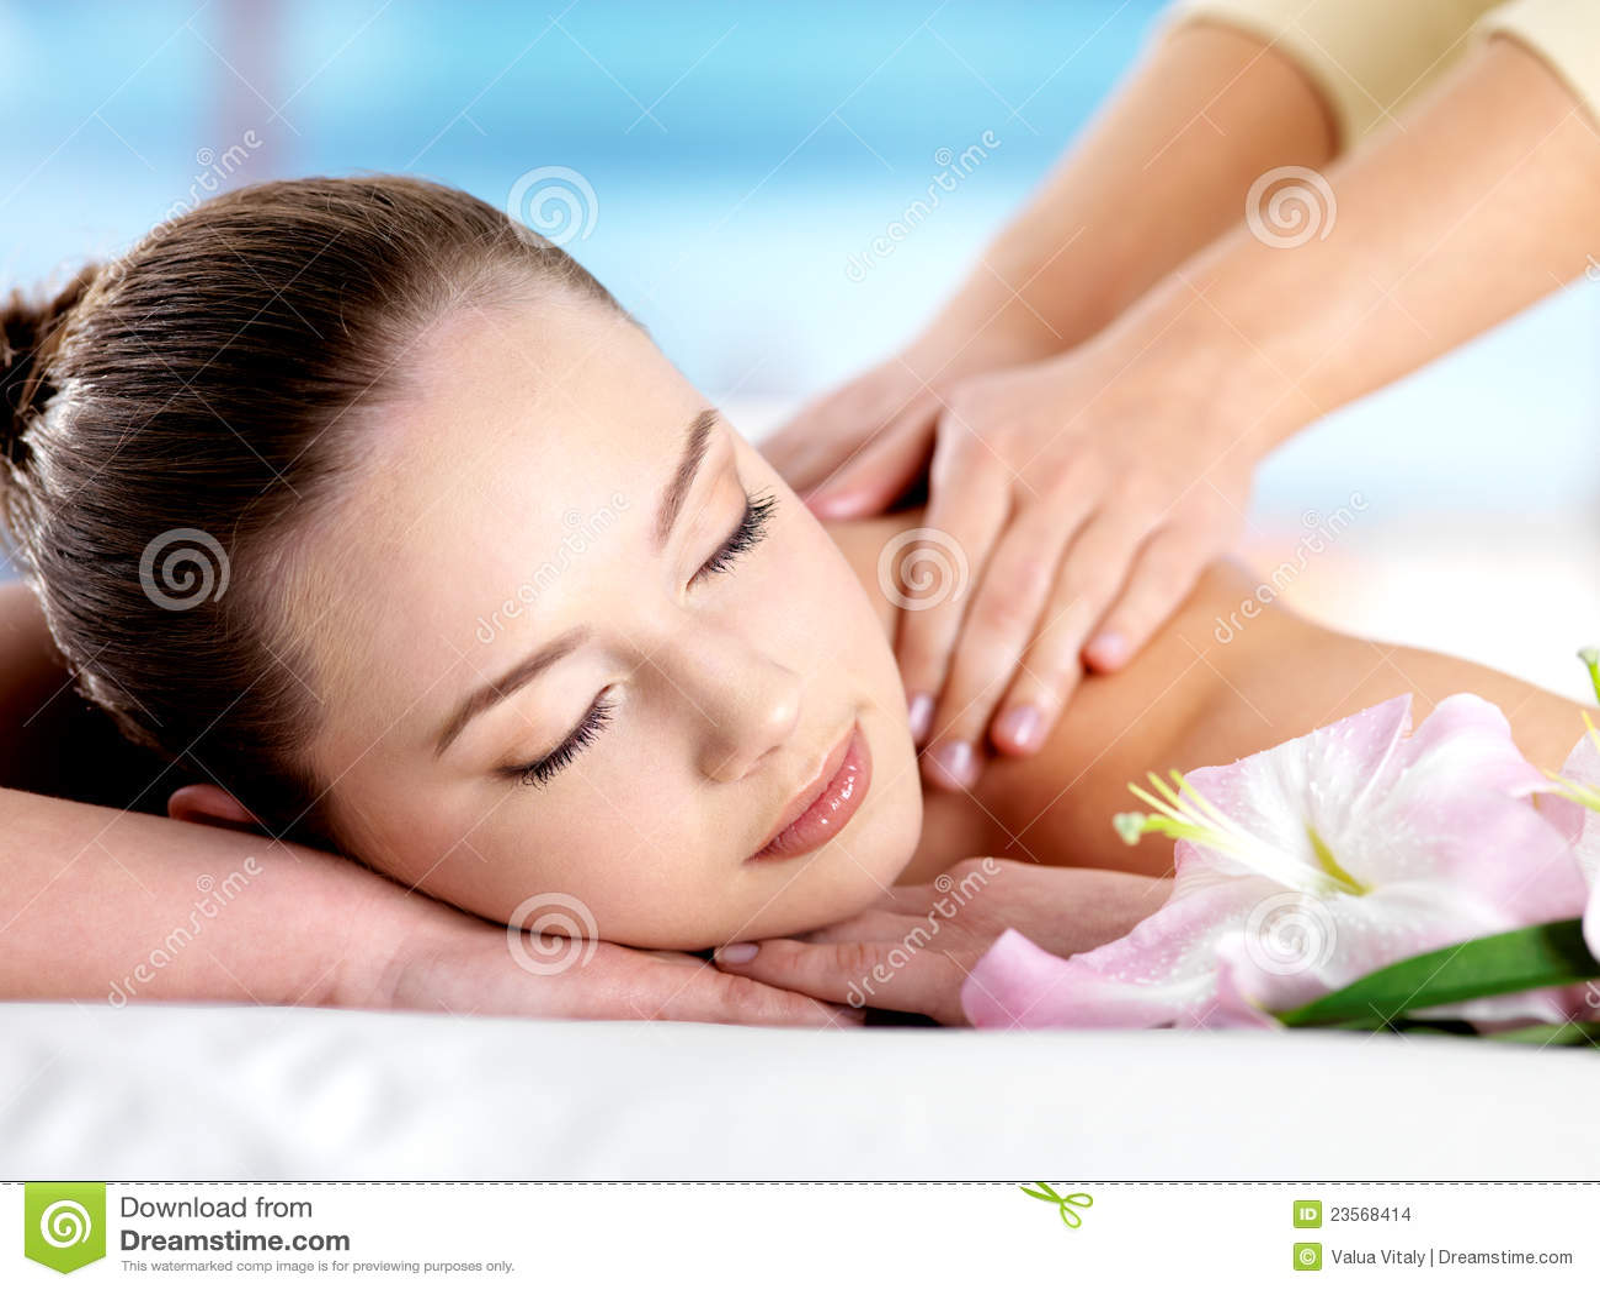 Woman Having Body Massage Stock Images - Image: 23568414